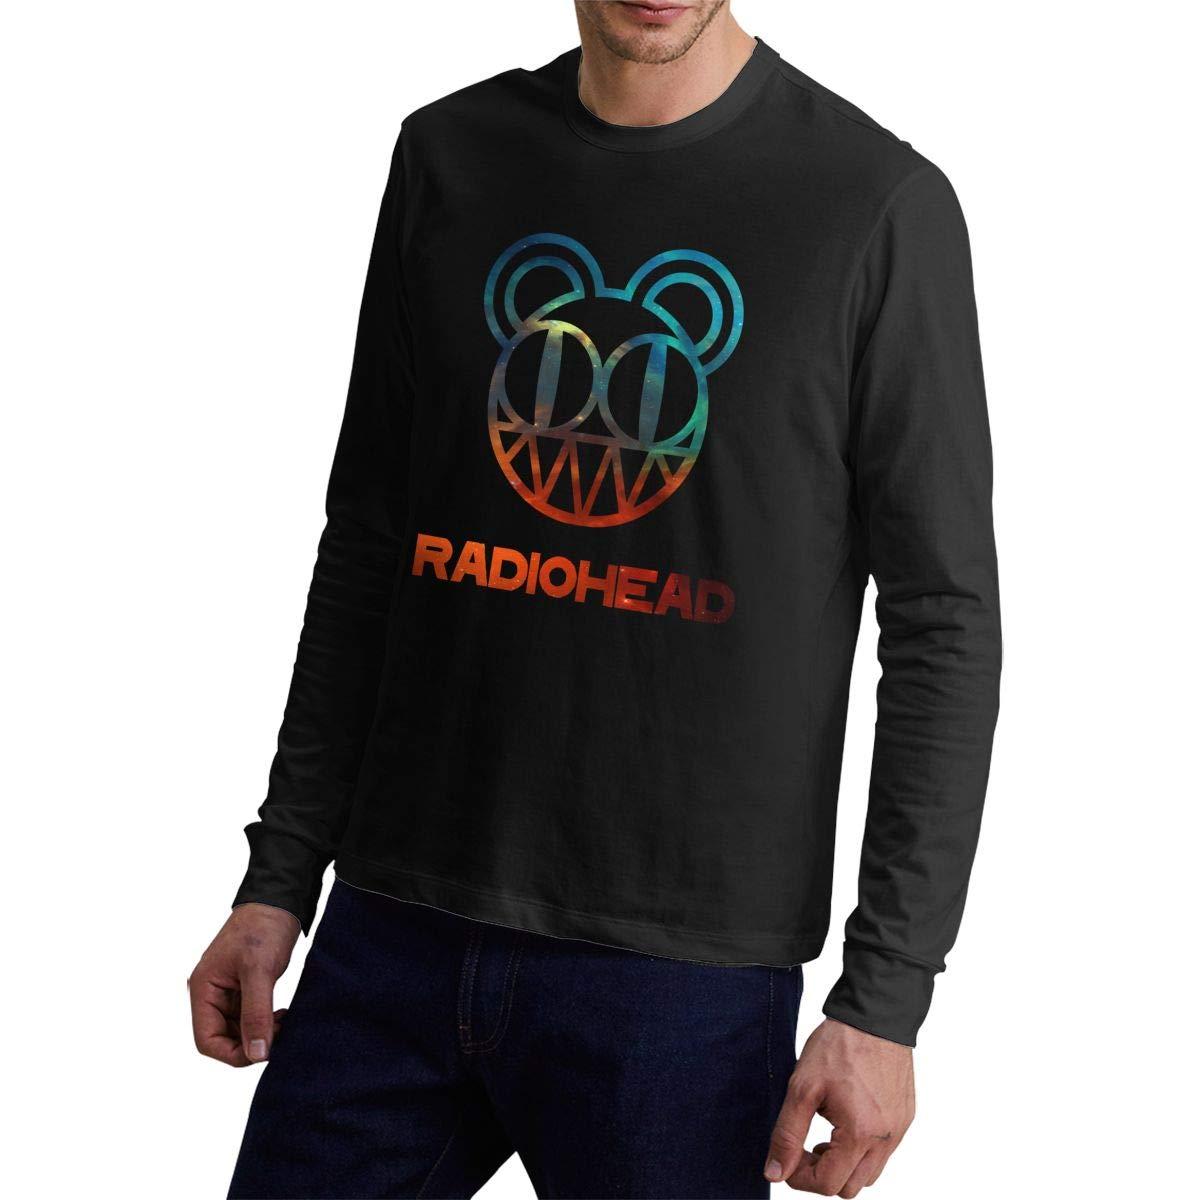 StevenSapp Radiohead Casual Mens Long Sleeve Tee Shirt